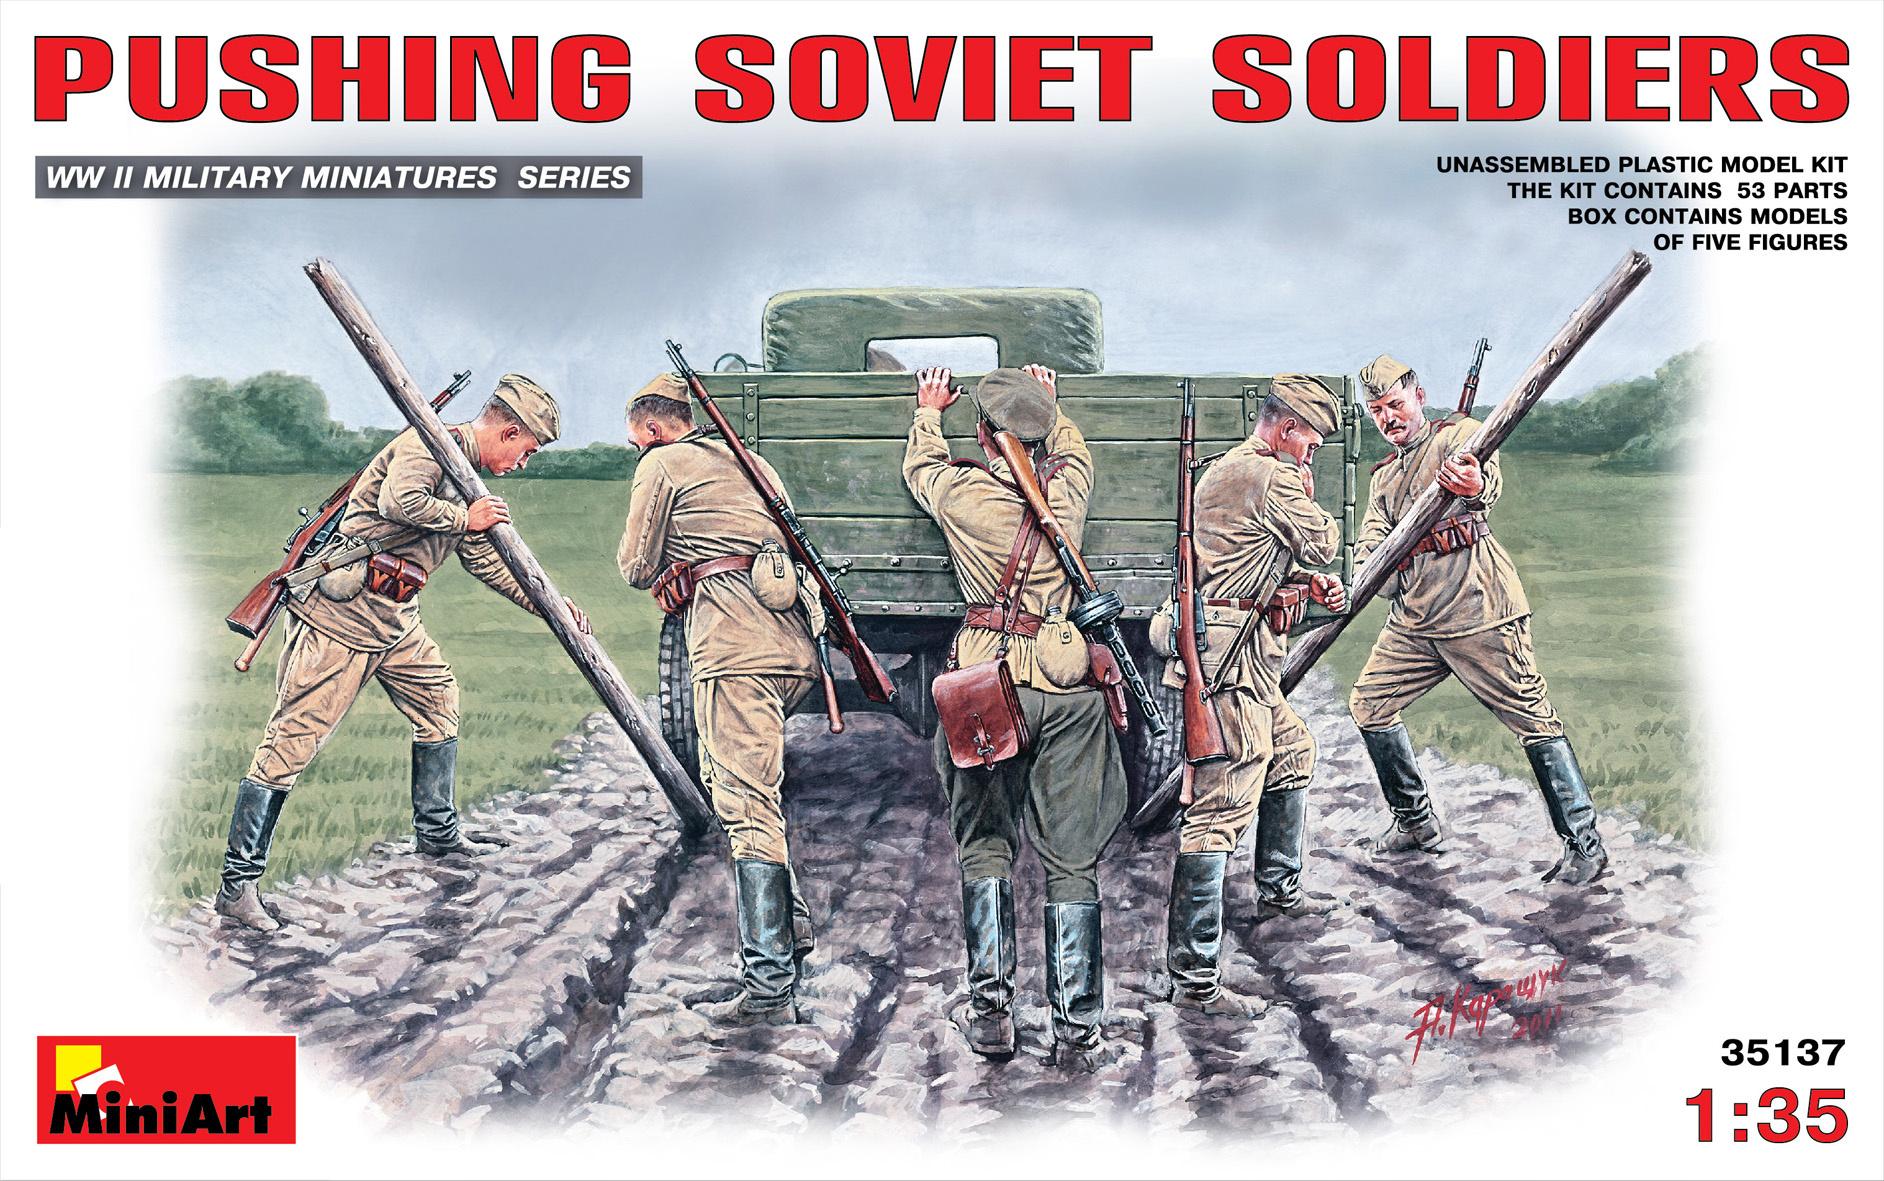 MiniArt Pushing Soviet Soldiers - Scale 1/35 - Mini Art - MIT35137